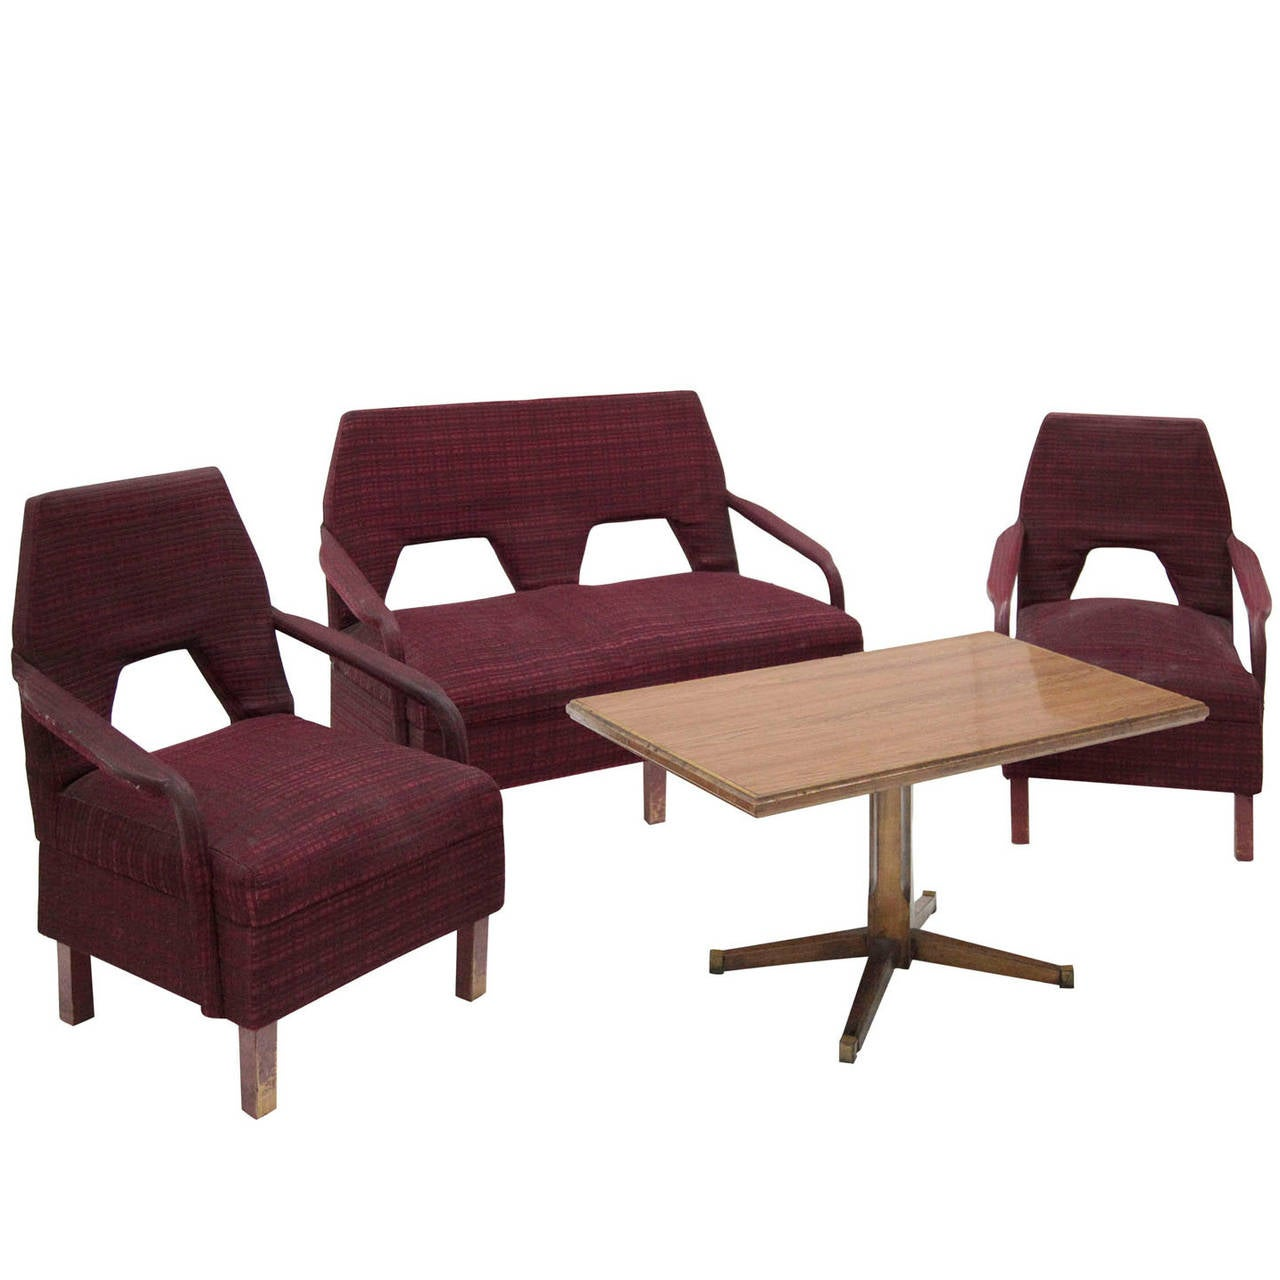 Italian living room set at 1stdibs for Italian living room furniture